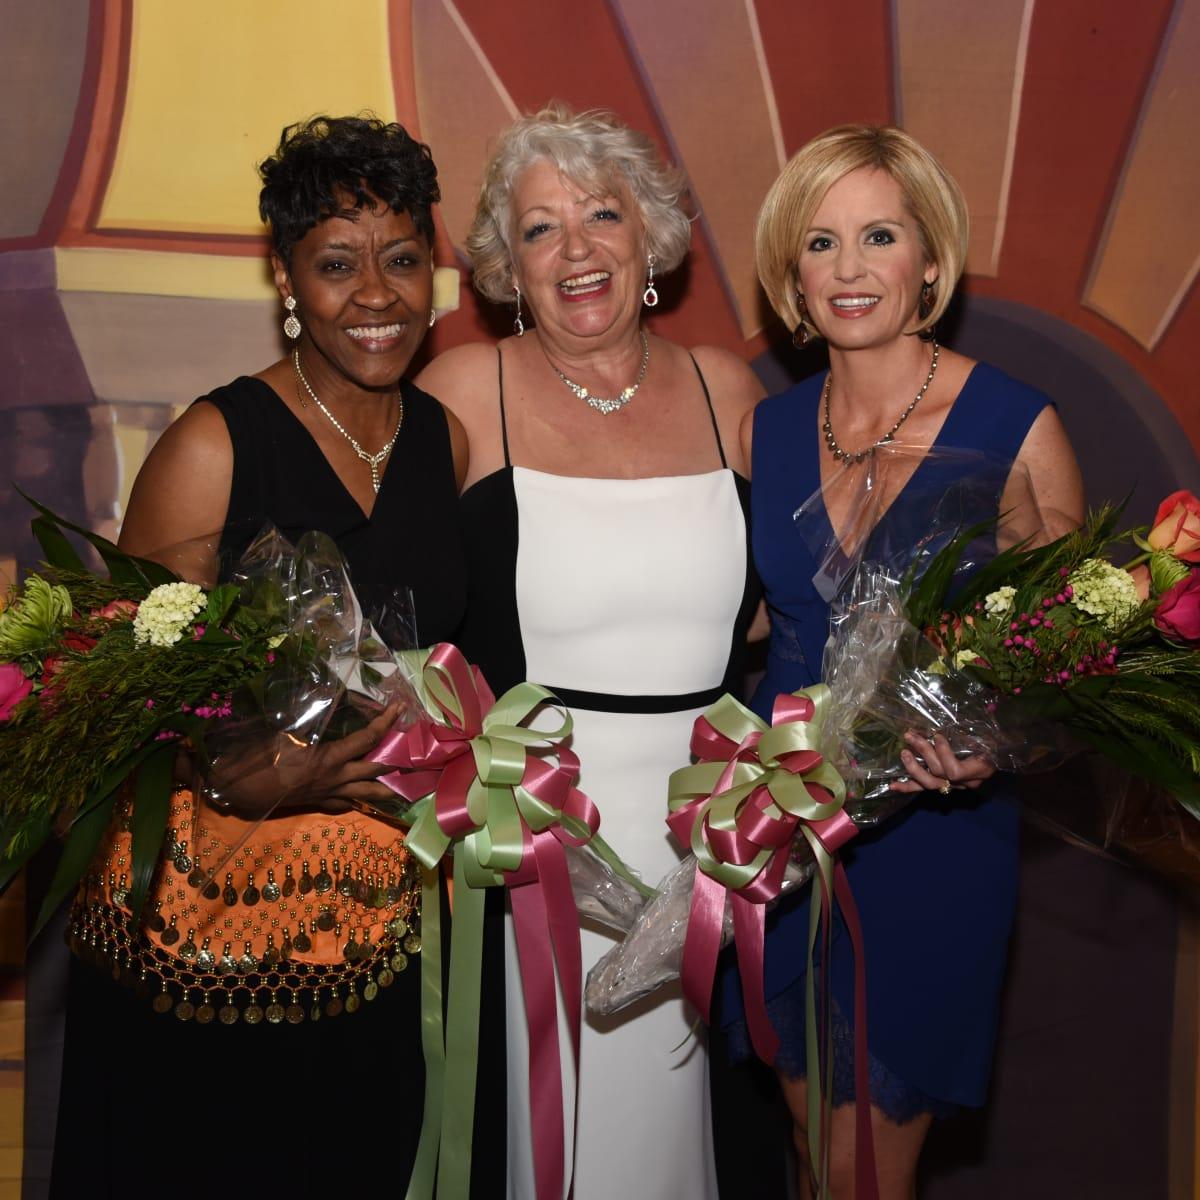 Crossroads School gala, 4/16, Yolanda Cameron, Dr. Gila Arnoni, Amy Davis